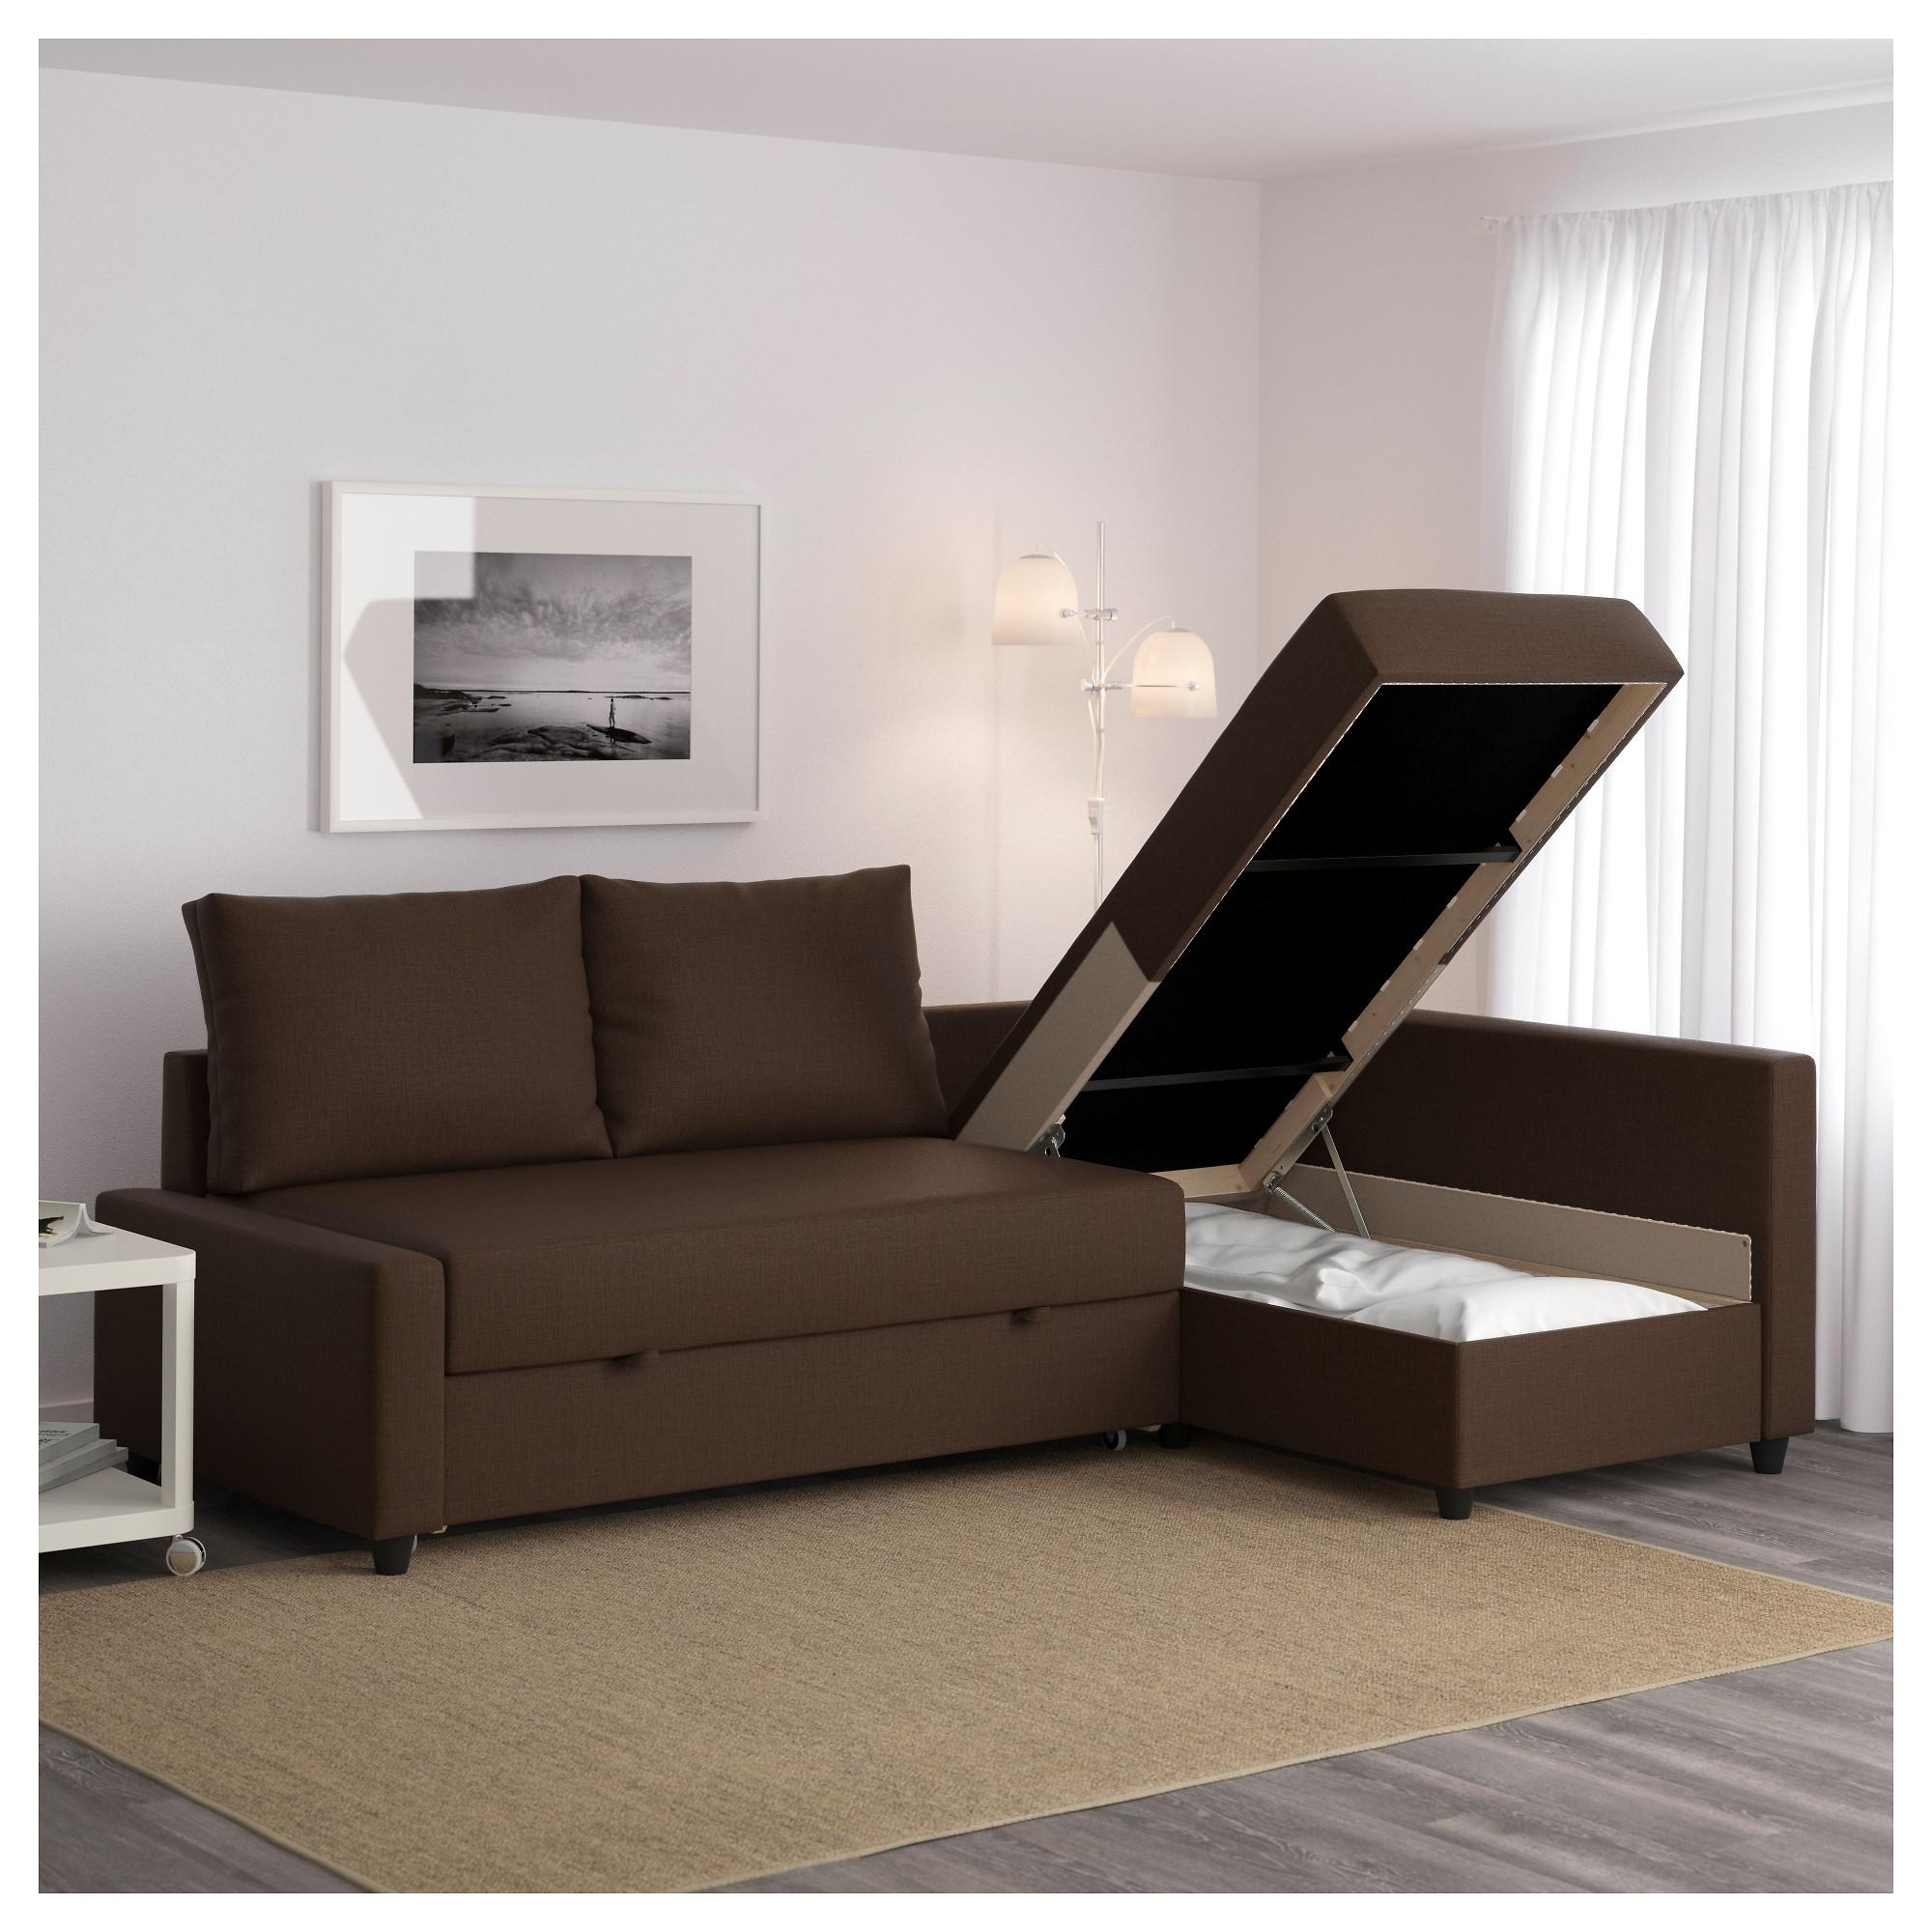 Latest Friheten Corner Sofa Bed With Storage Skiftebo Brown – Ikea Pertaining To Ikea Corner Sofas With Storage (View 5 of 15)